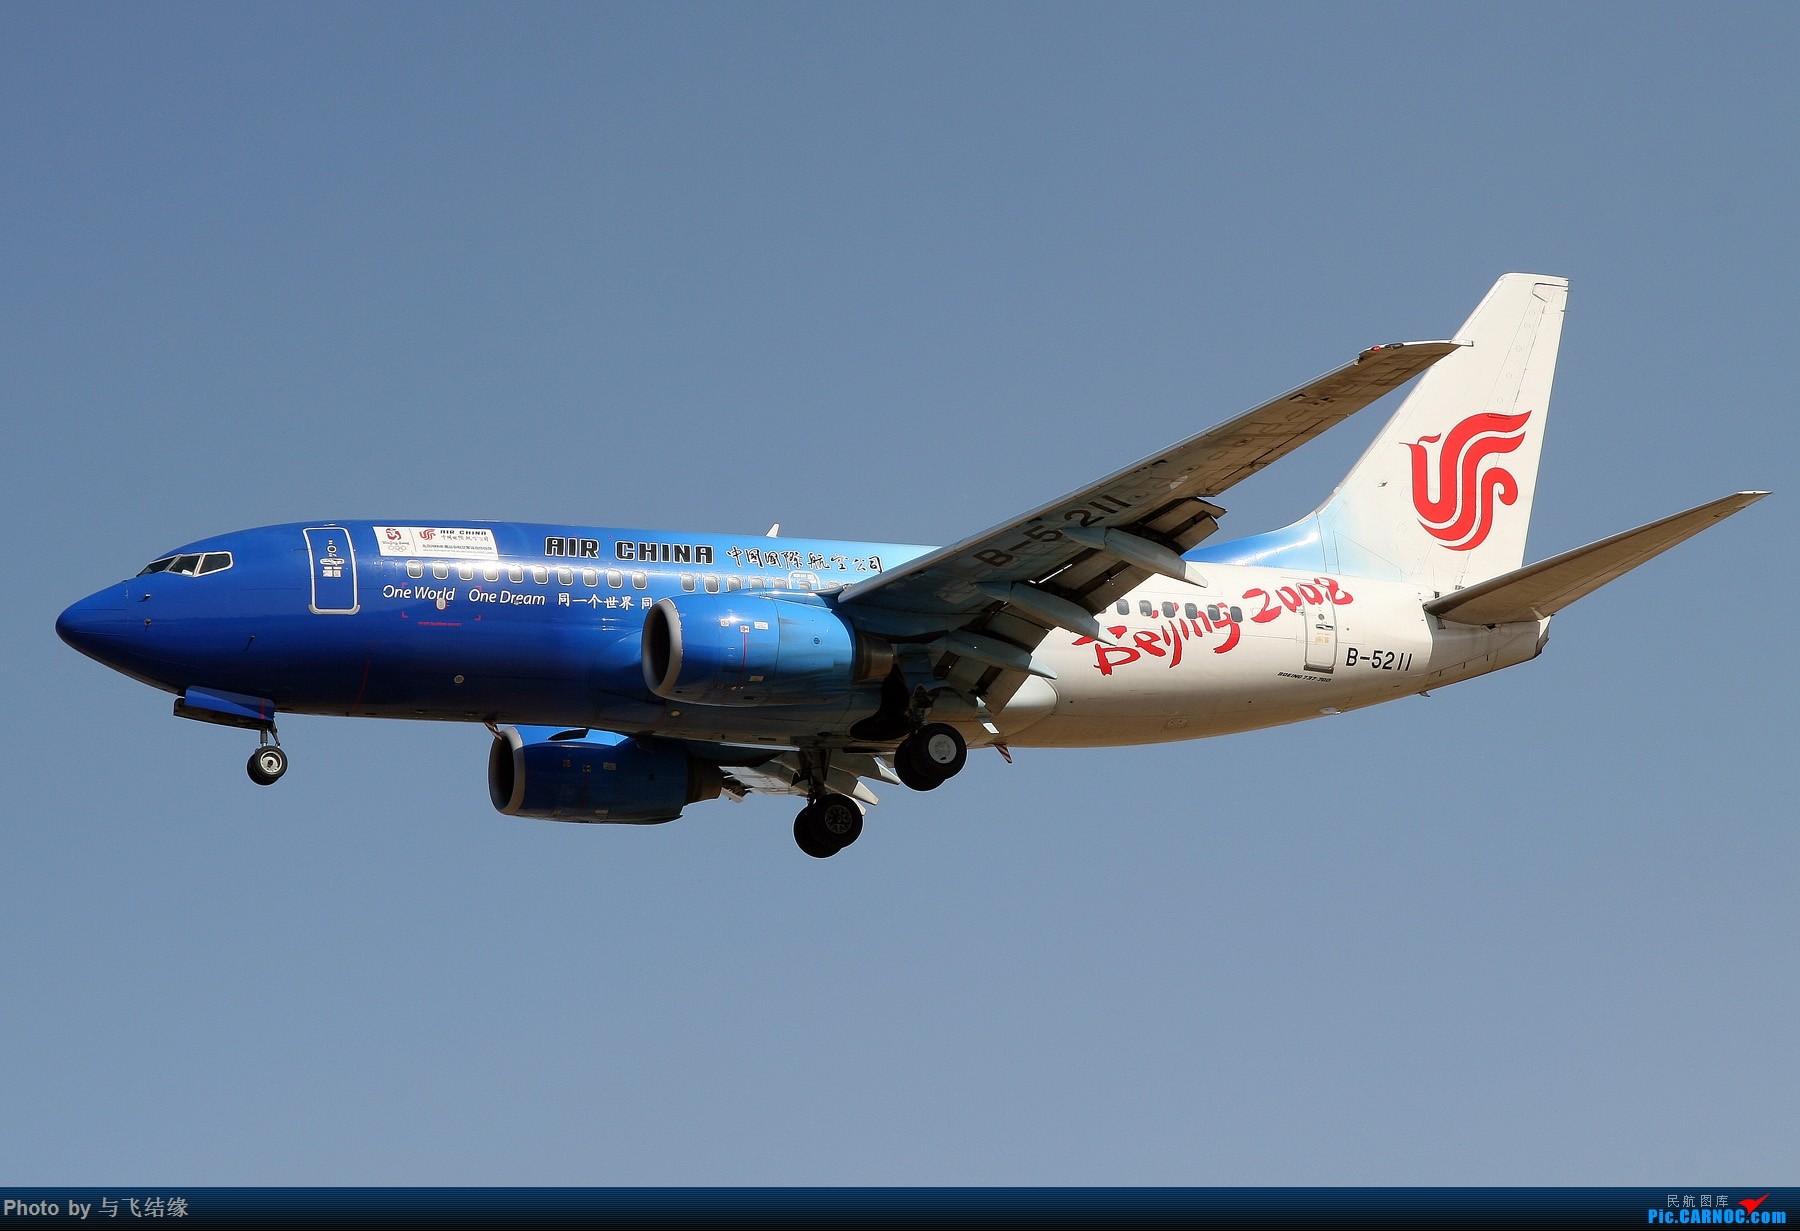 Re:[公告]传承奥运精神 寻找那些年曾经拍过的国航奥运彩绘机~ 贴图有大奖哦!!! BOEING 737-700 B-5211 中国北京首都国际机场